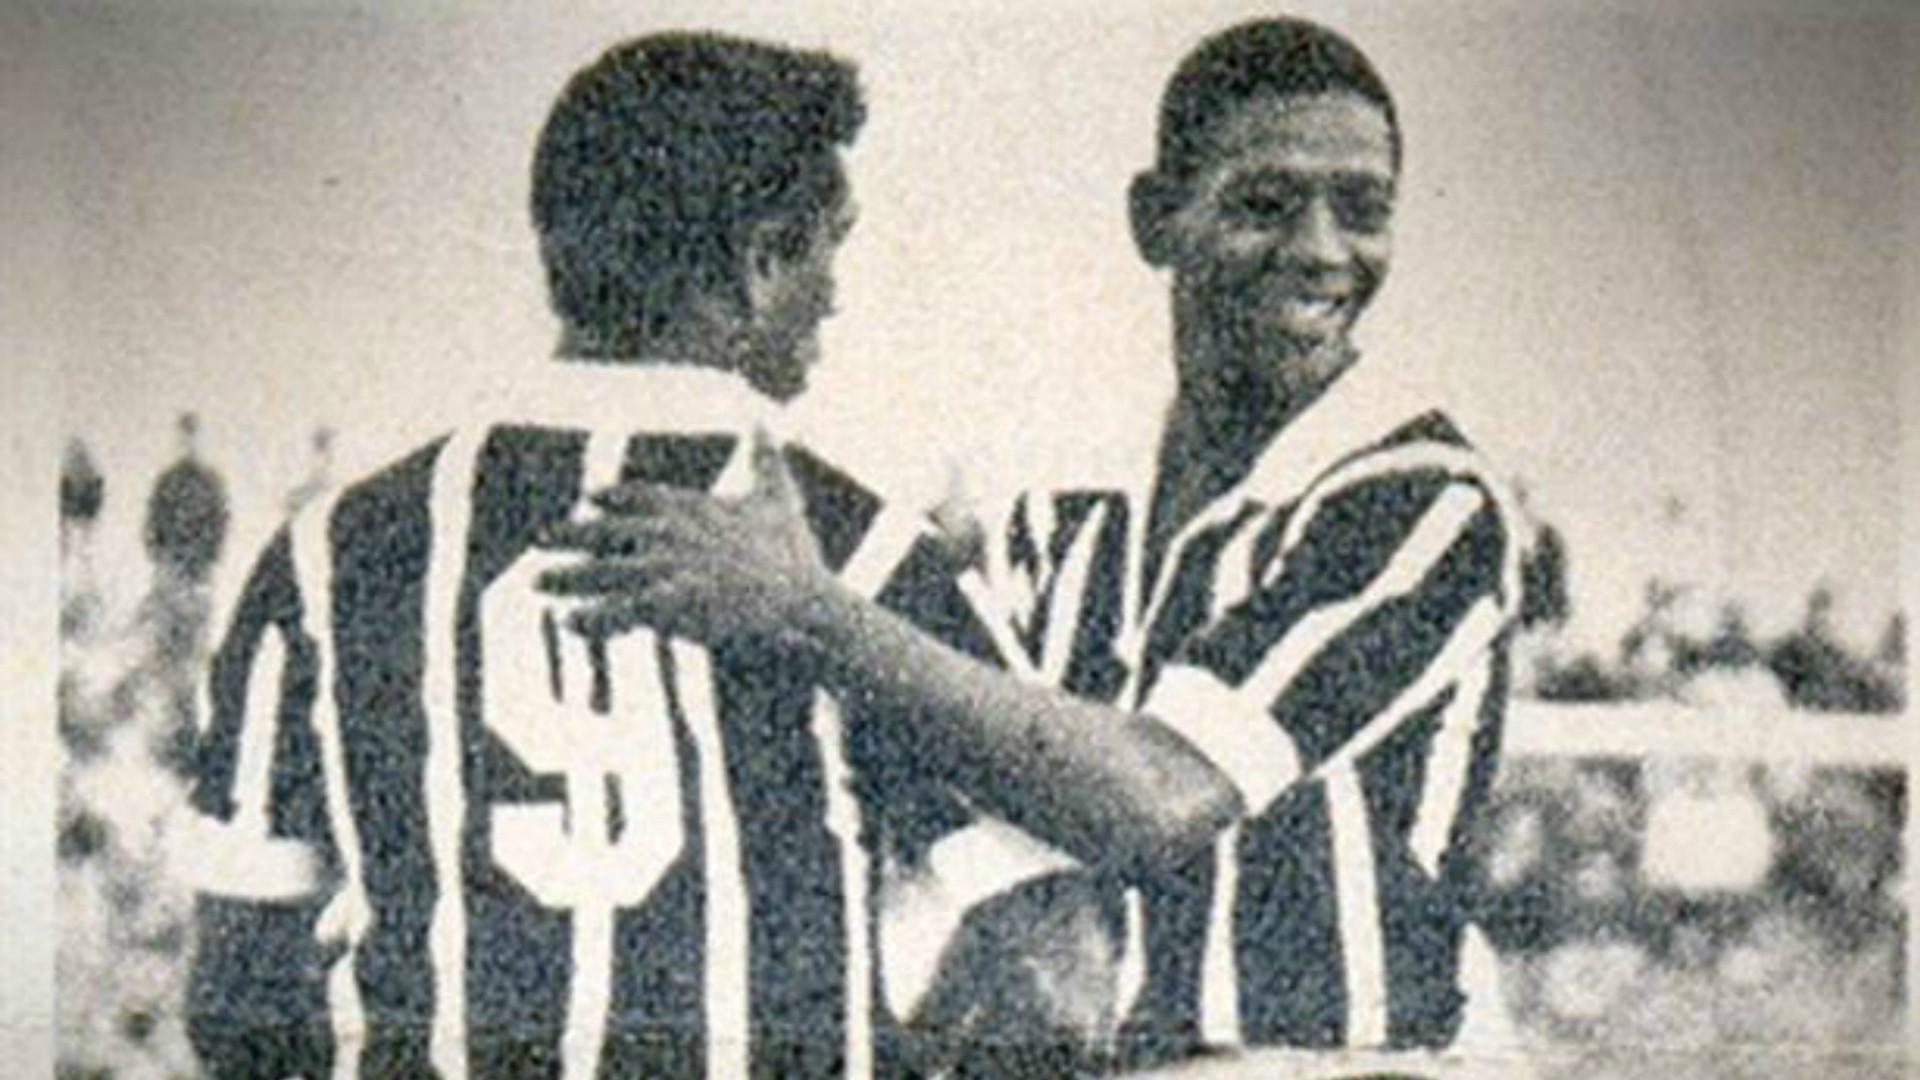 Paulo Borges e Flávio - Corinthians 1968